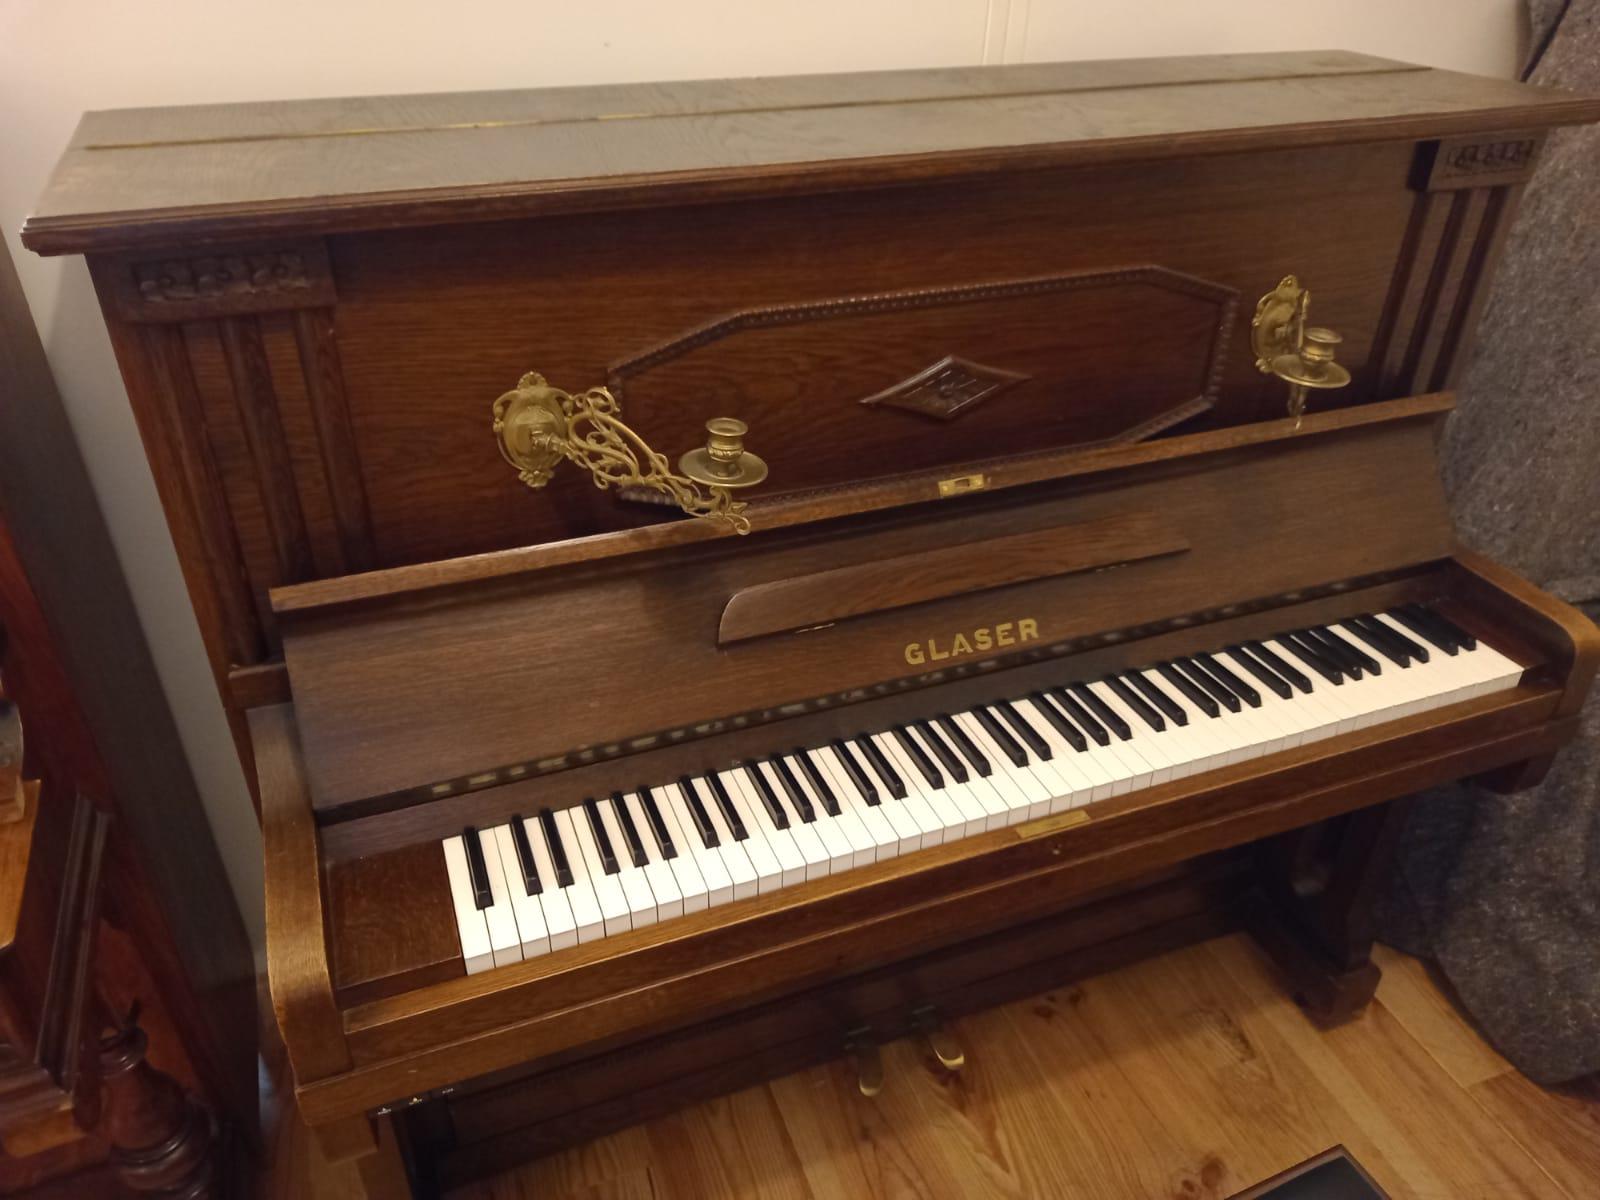 Glaser piano